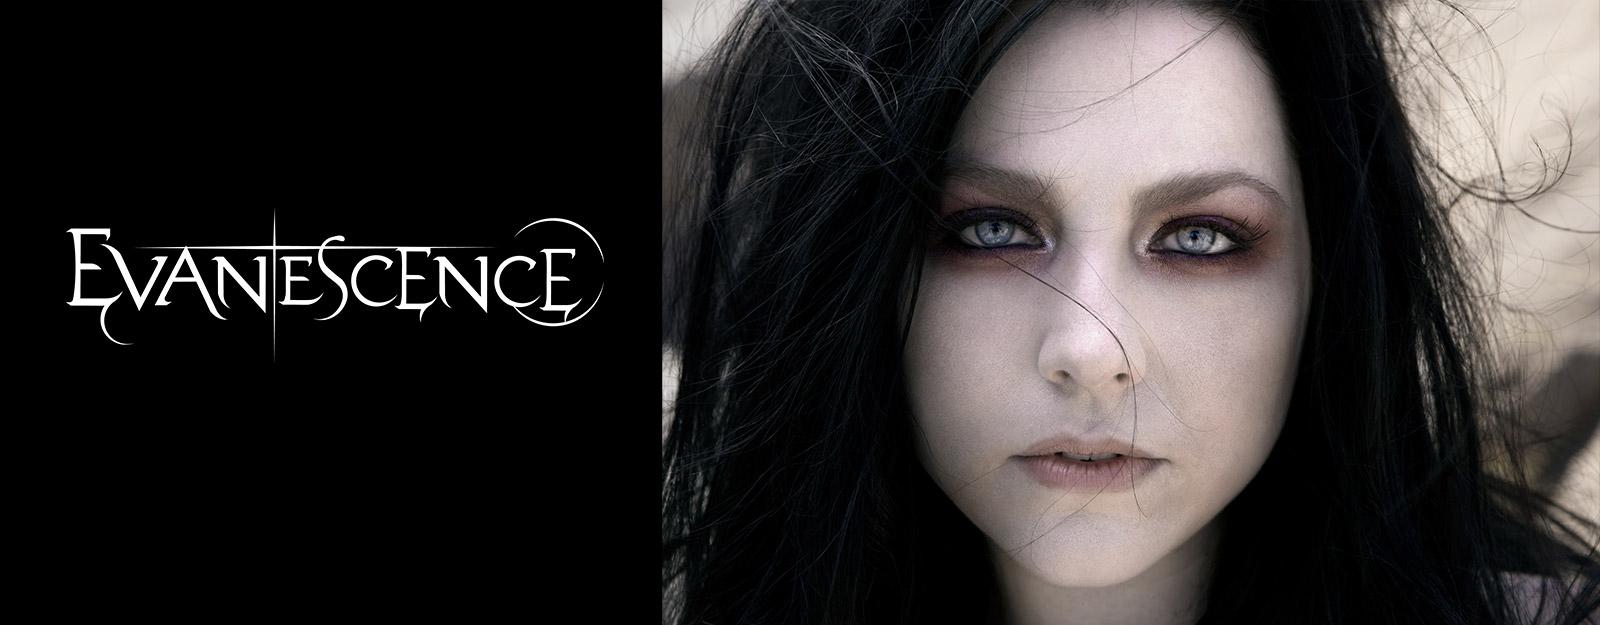 EVANESCENCE 約3年ぶりの来日!OZZFEST JAPAN 2015 は必見!